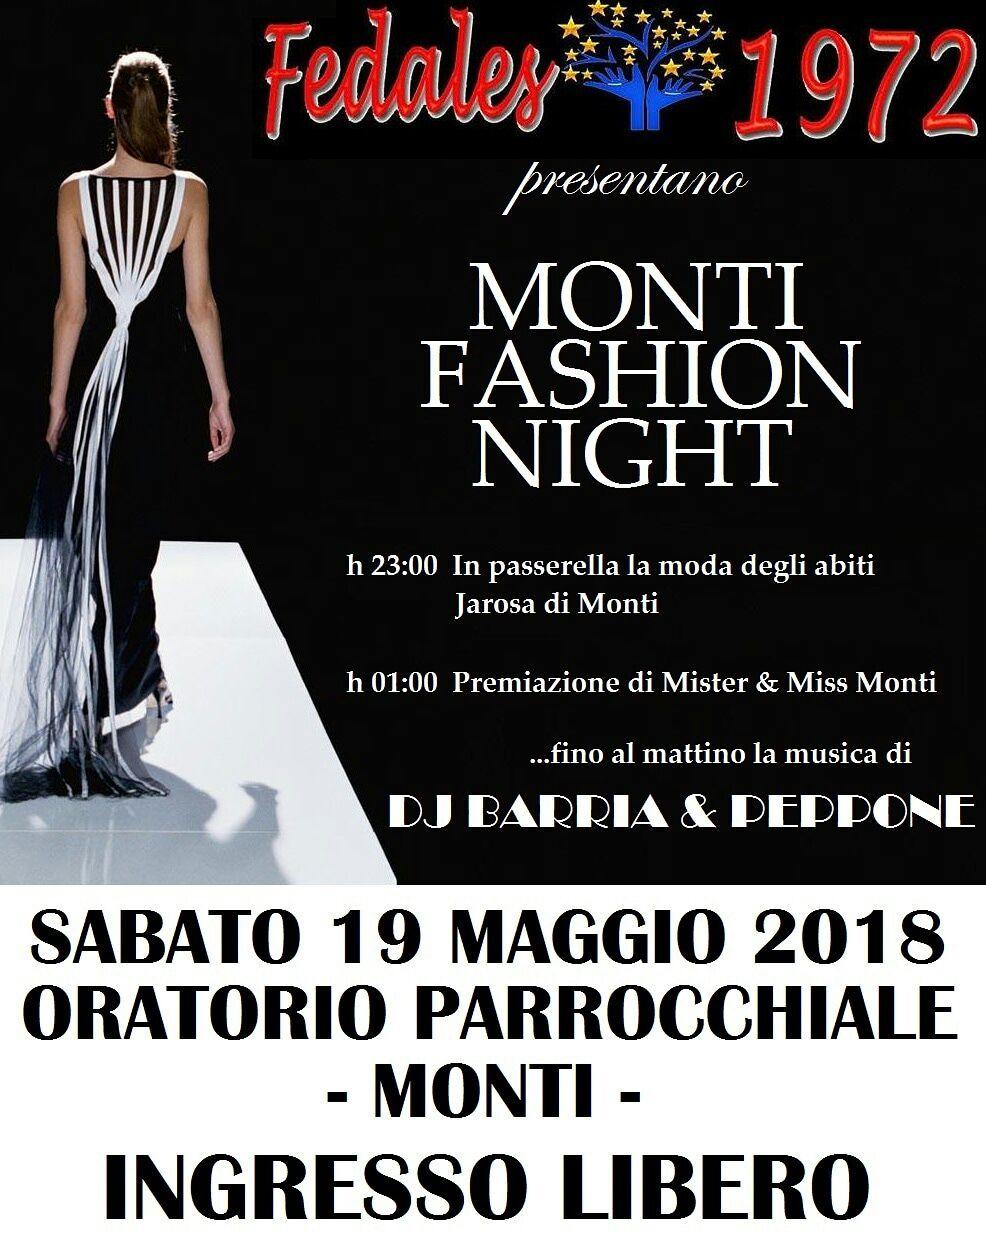 Monti fashion night